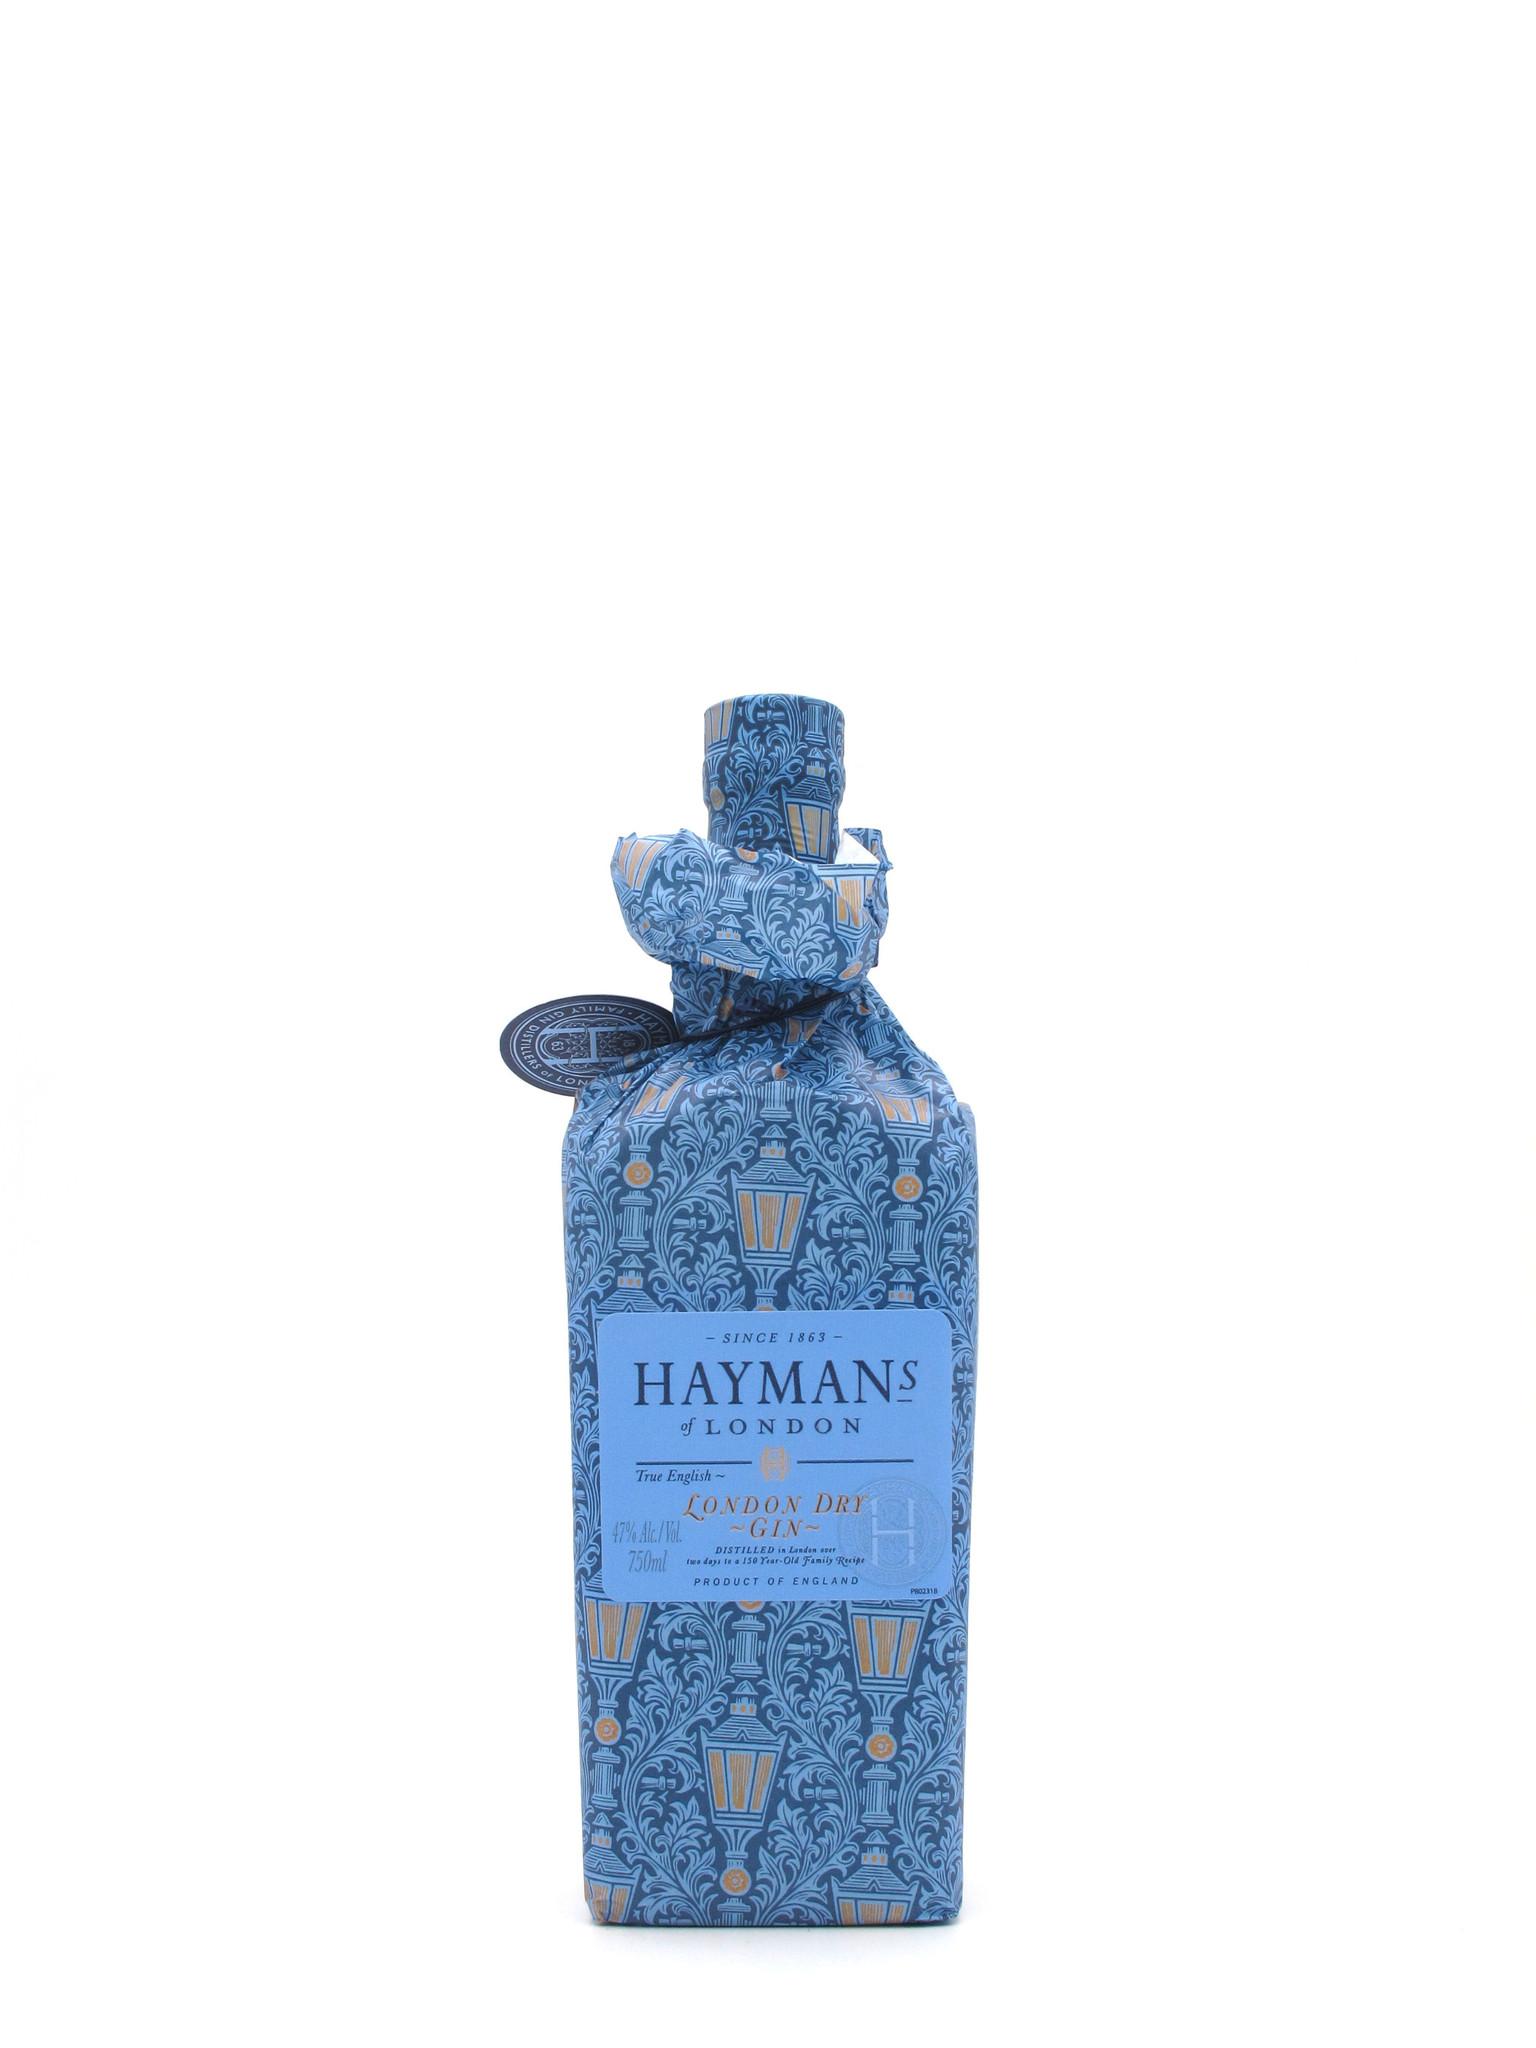 Haymans Hayman's London Dry Gin 750mL